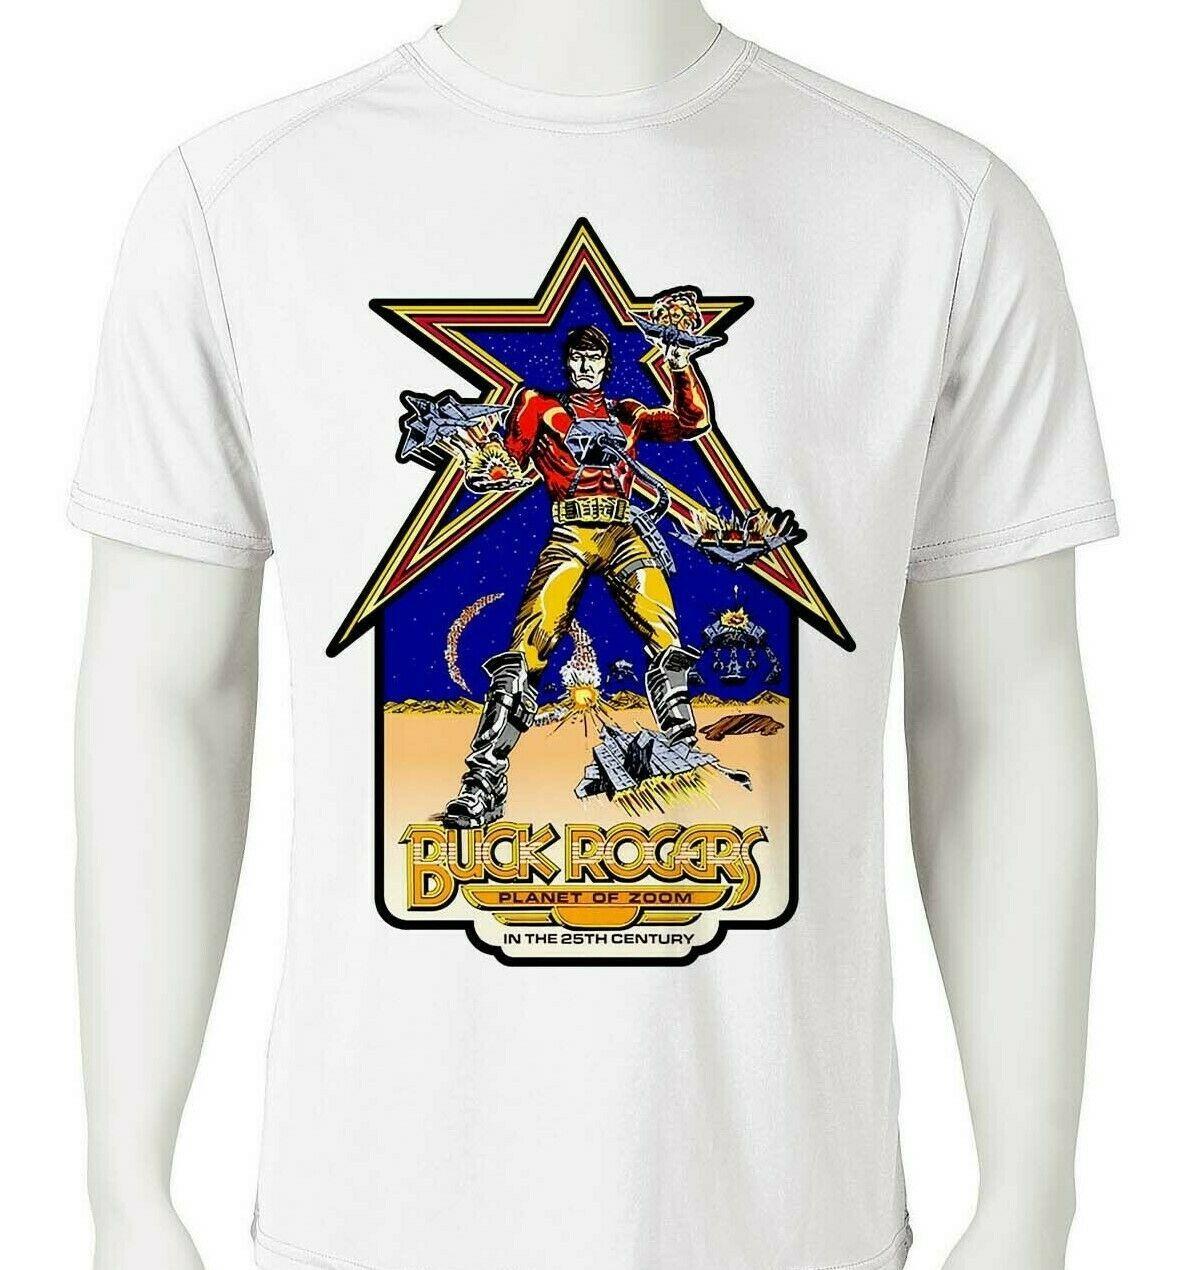 Buck rogers tee retro comics dri fit for sale online graphic tshirt